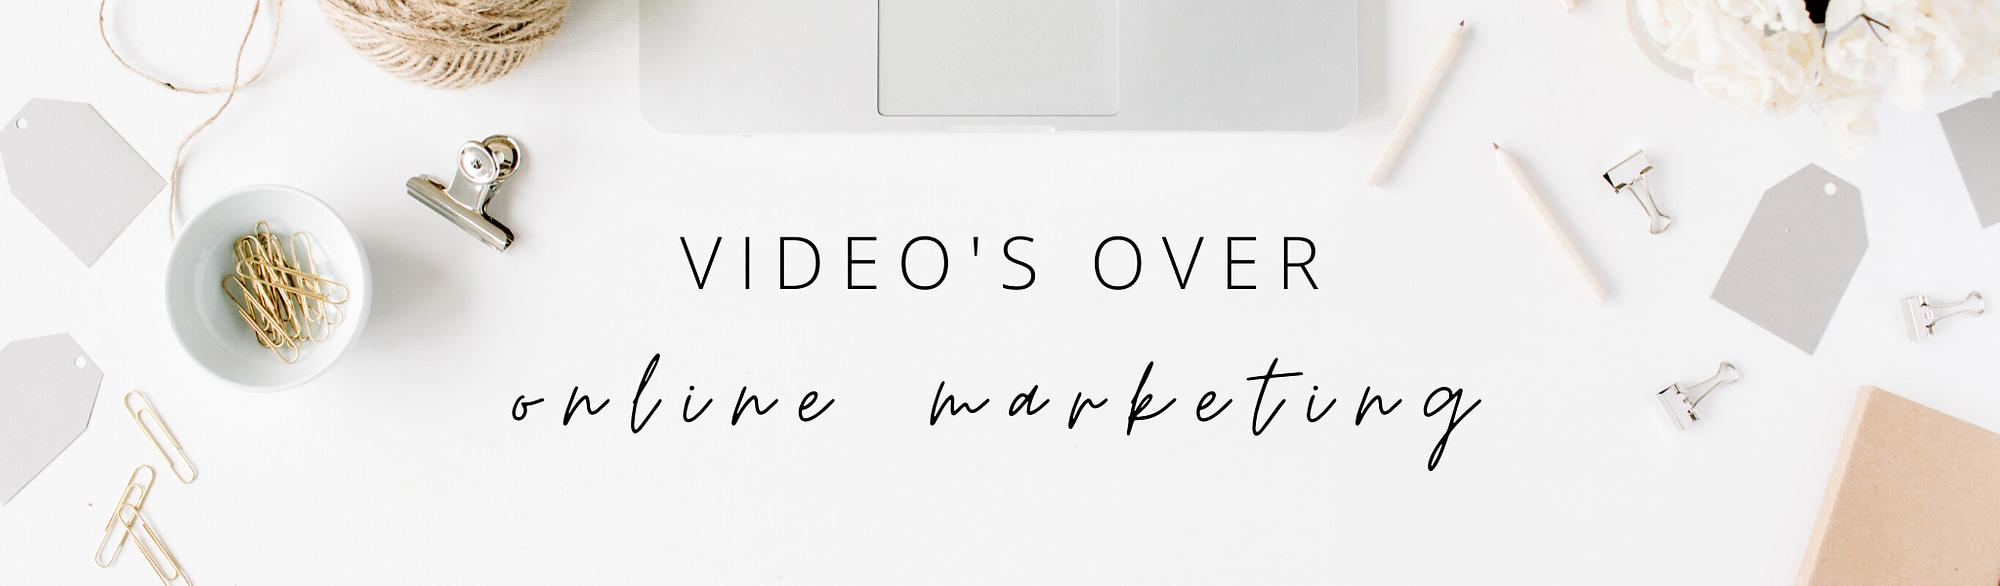 video's vol online marketing tips